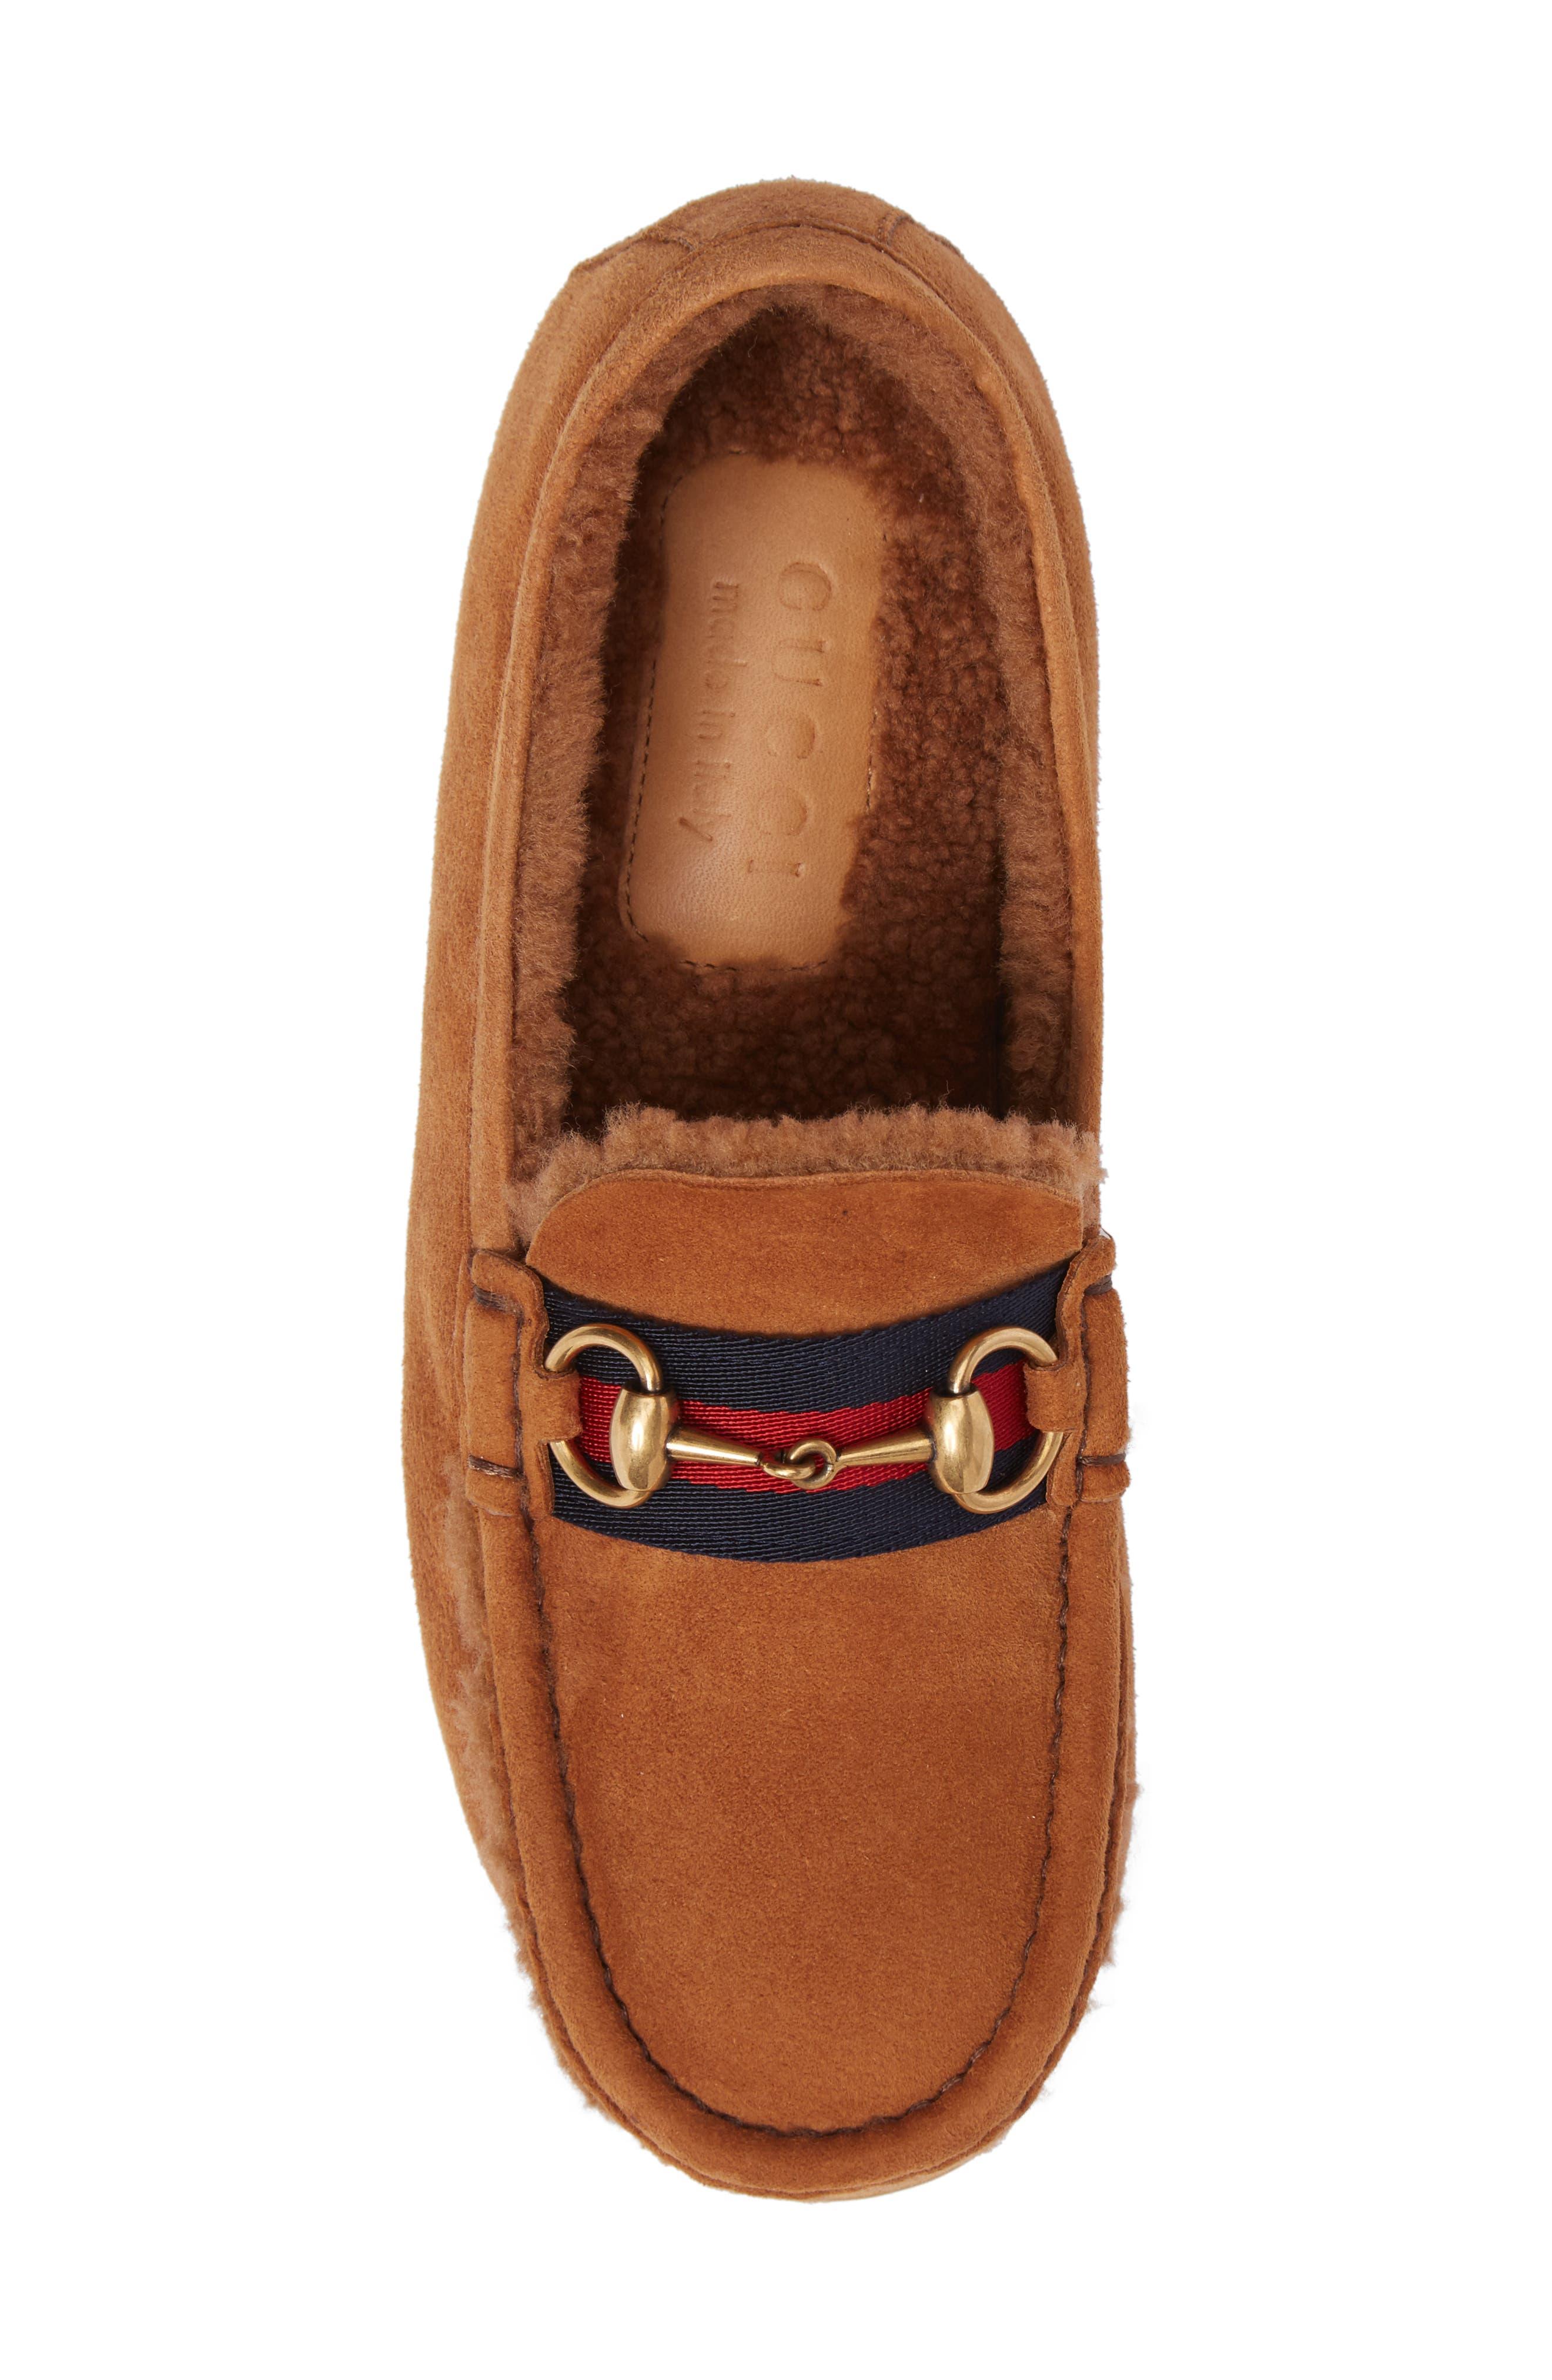 Driving Shoe with Genuine Shearling,                             Alternate thumbnail 5, color,                             Dark Tan